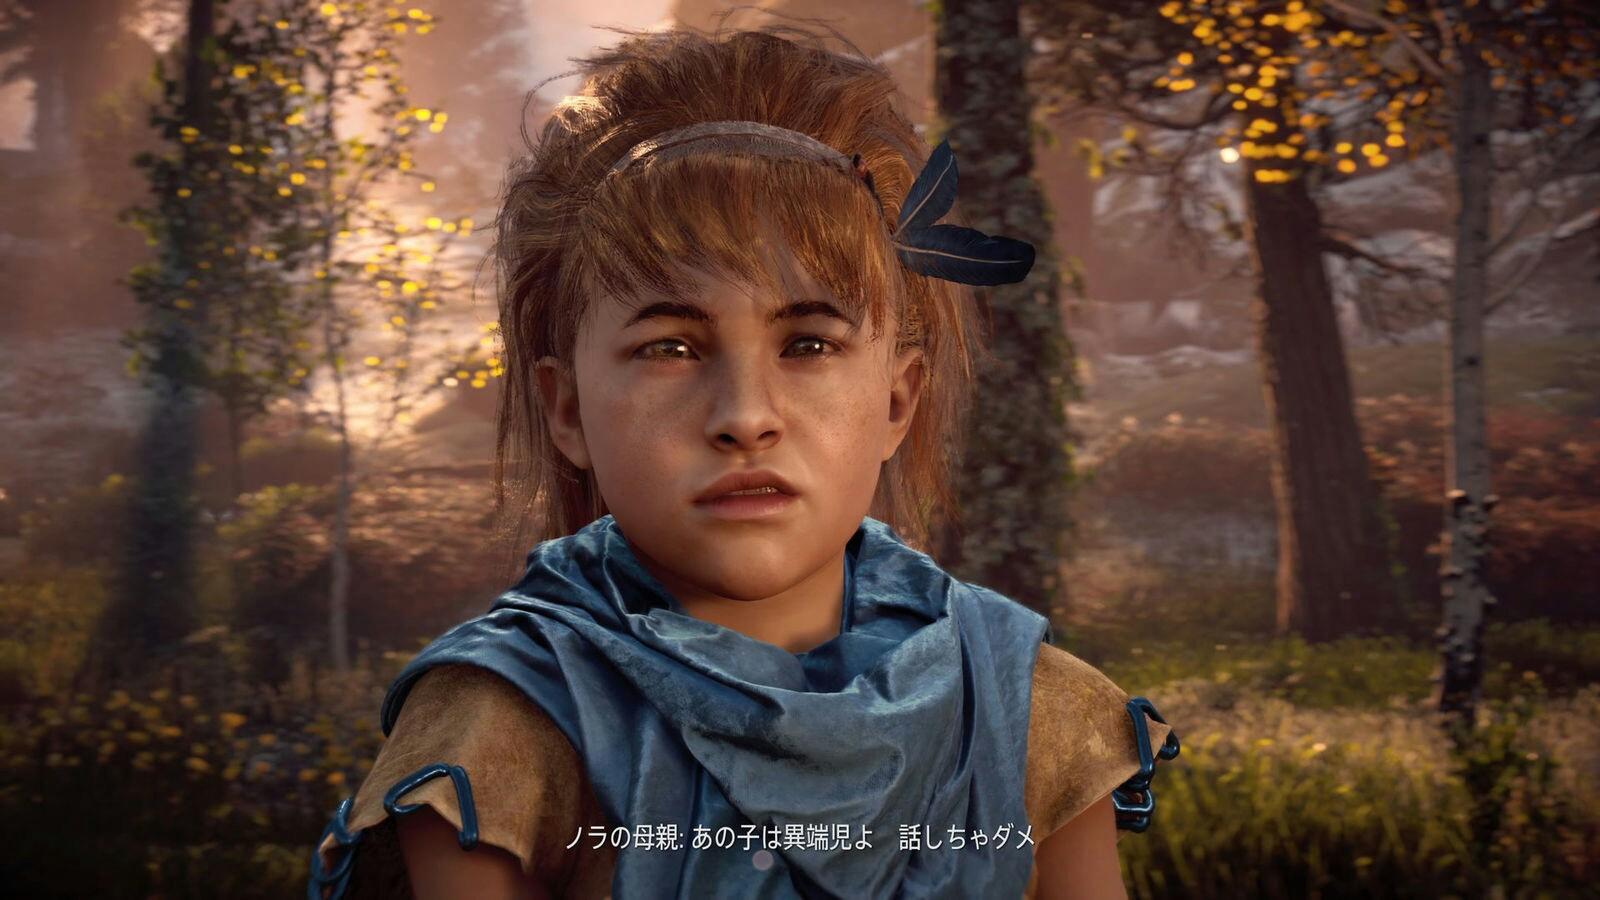 khEiHRF - 可愛い女の子が主人公の傑作ゲーム